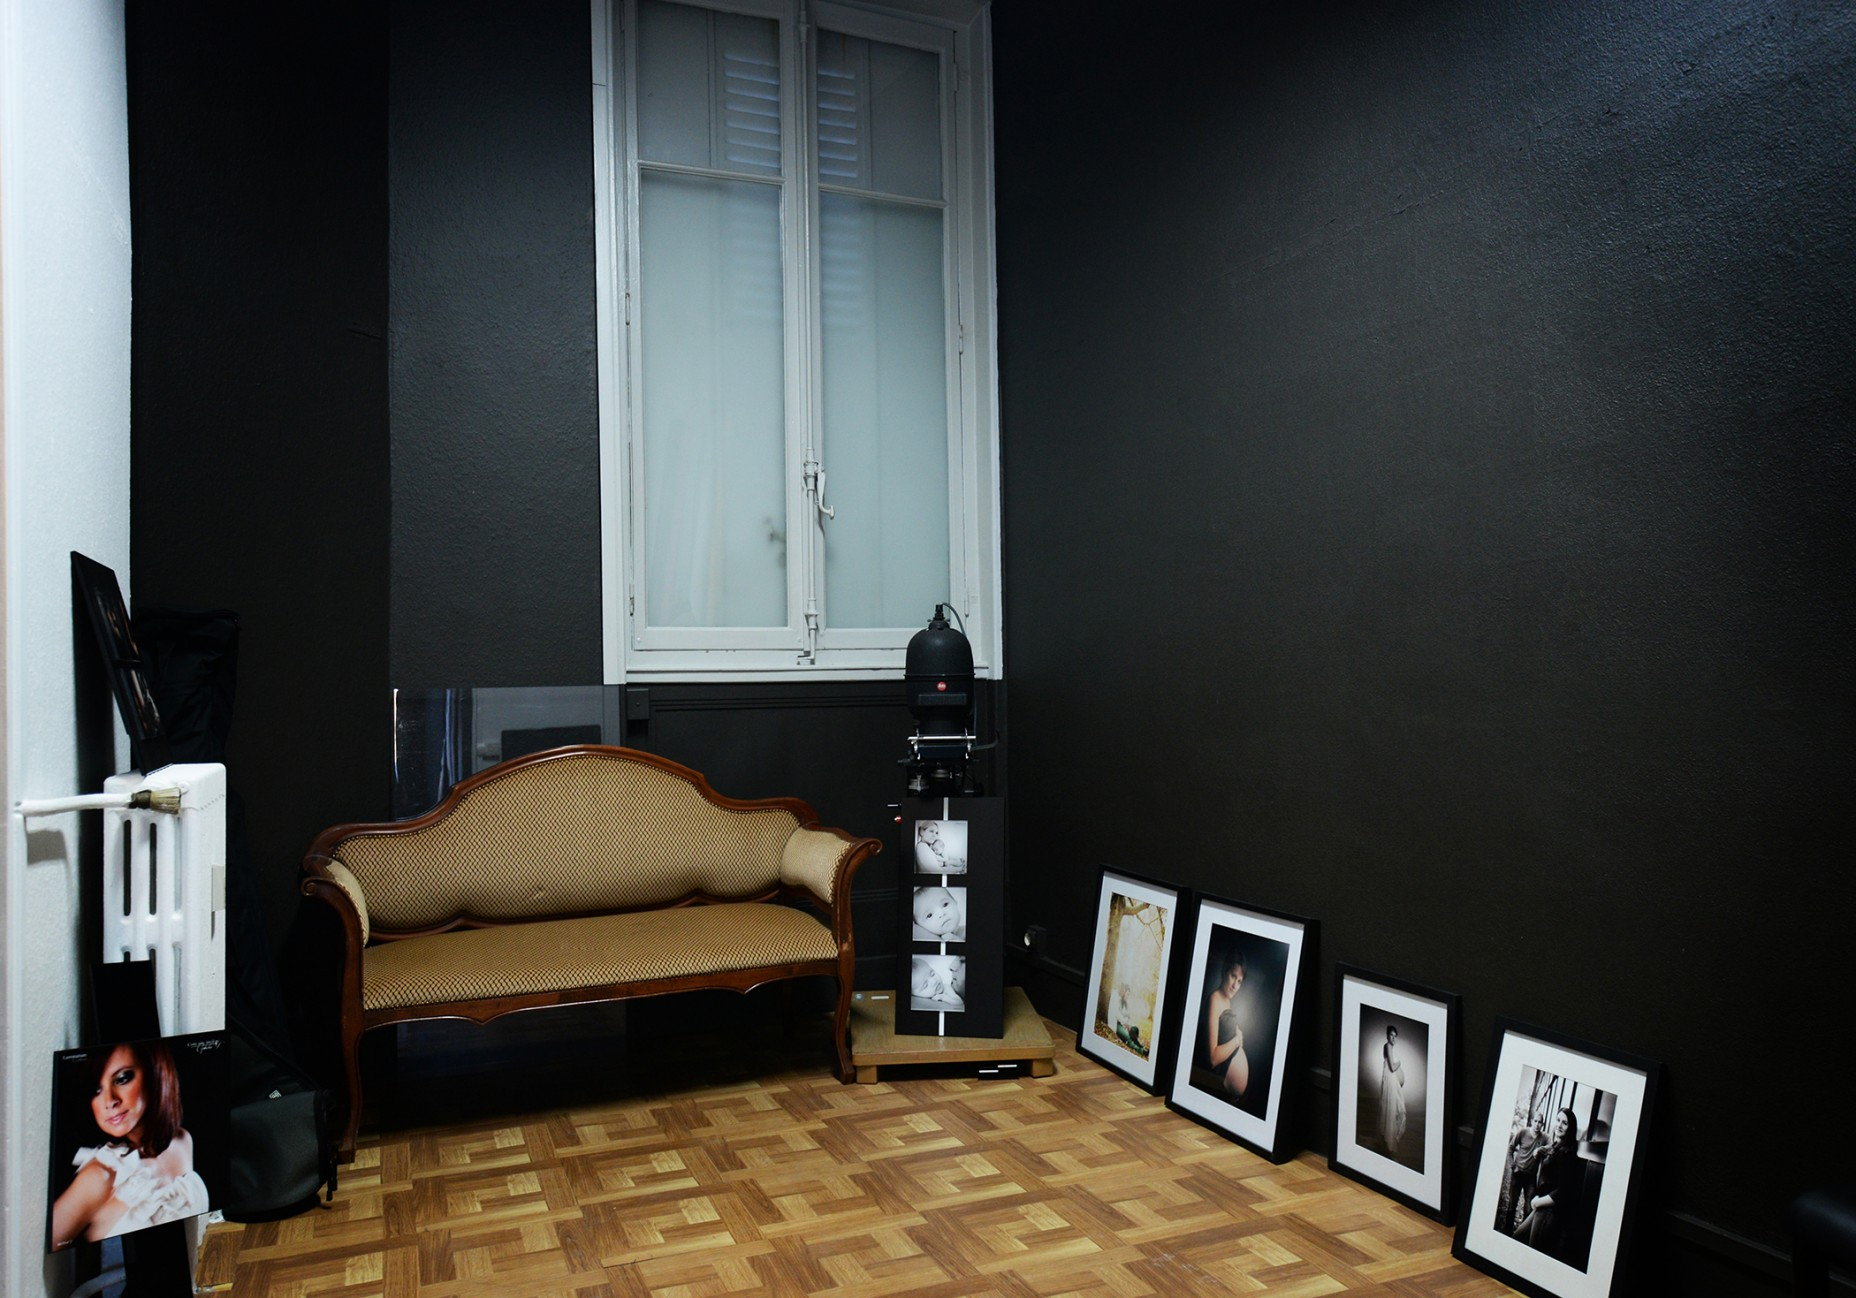 location studio photo Saint Etienne